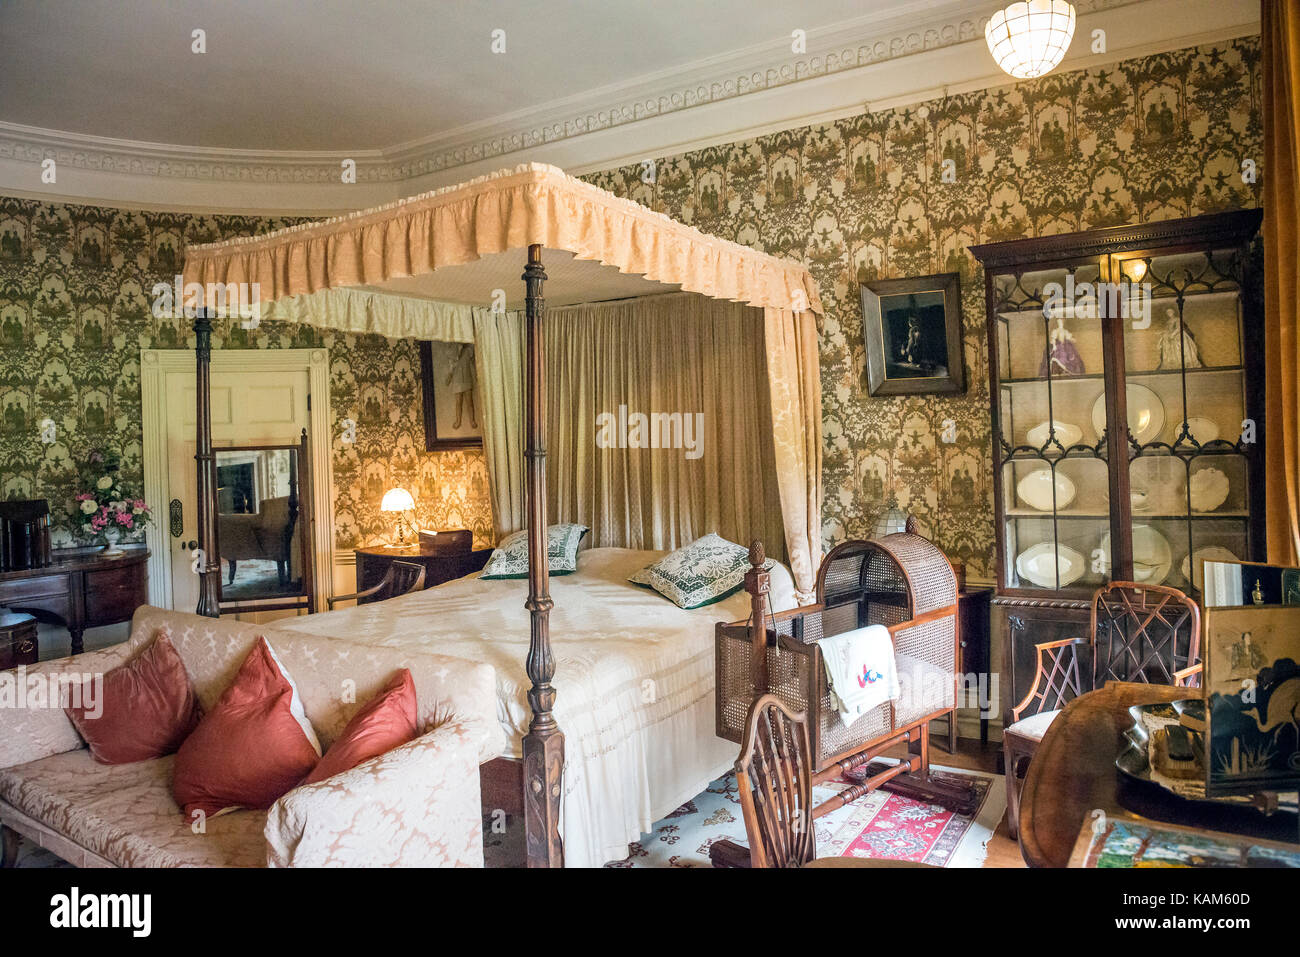 Interior of Quex House at Birchington-on-Sea, Kent, UK - Stock Image